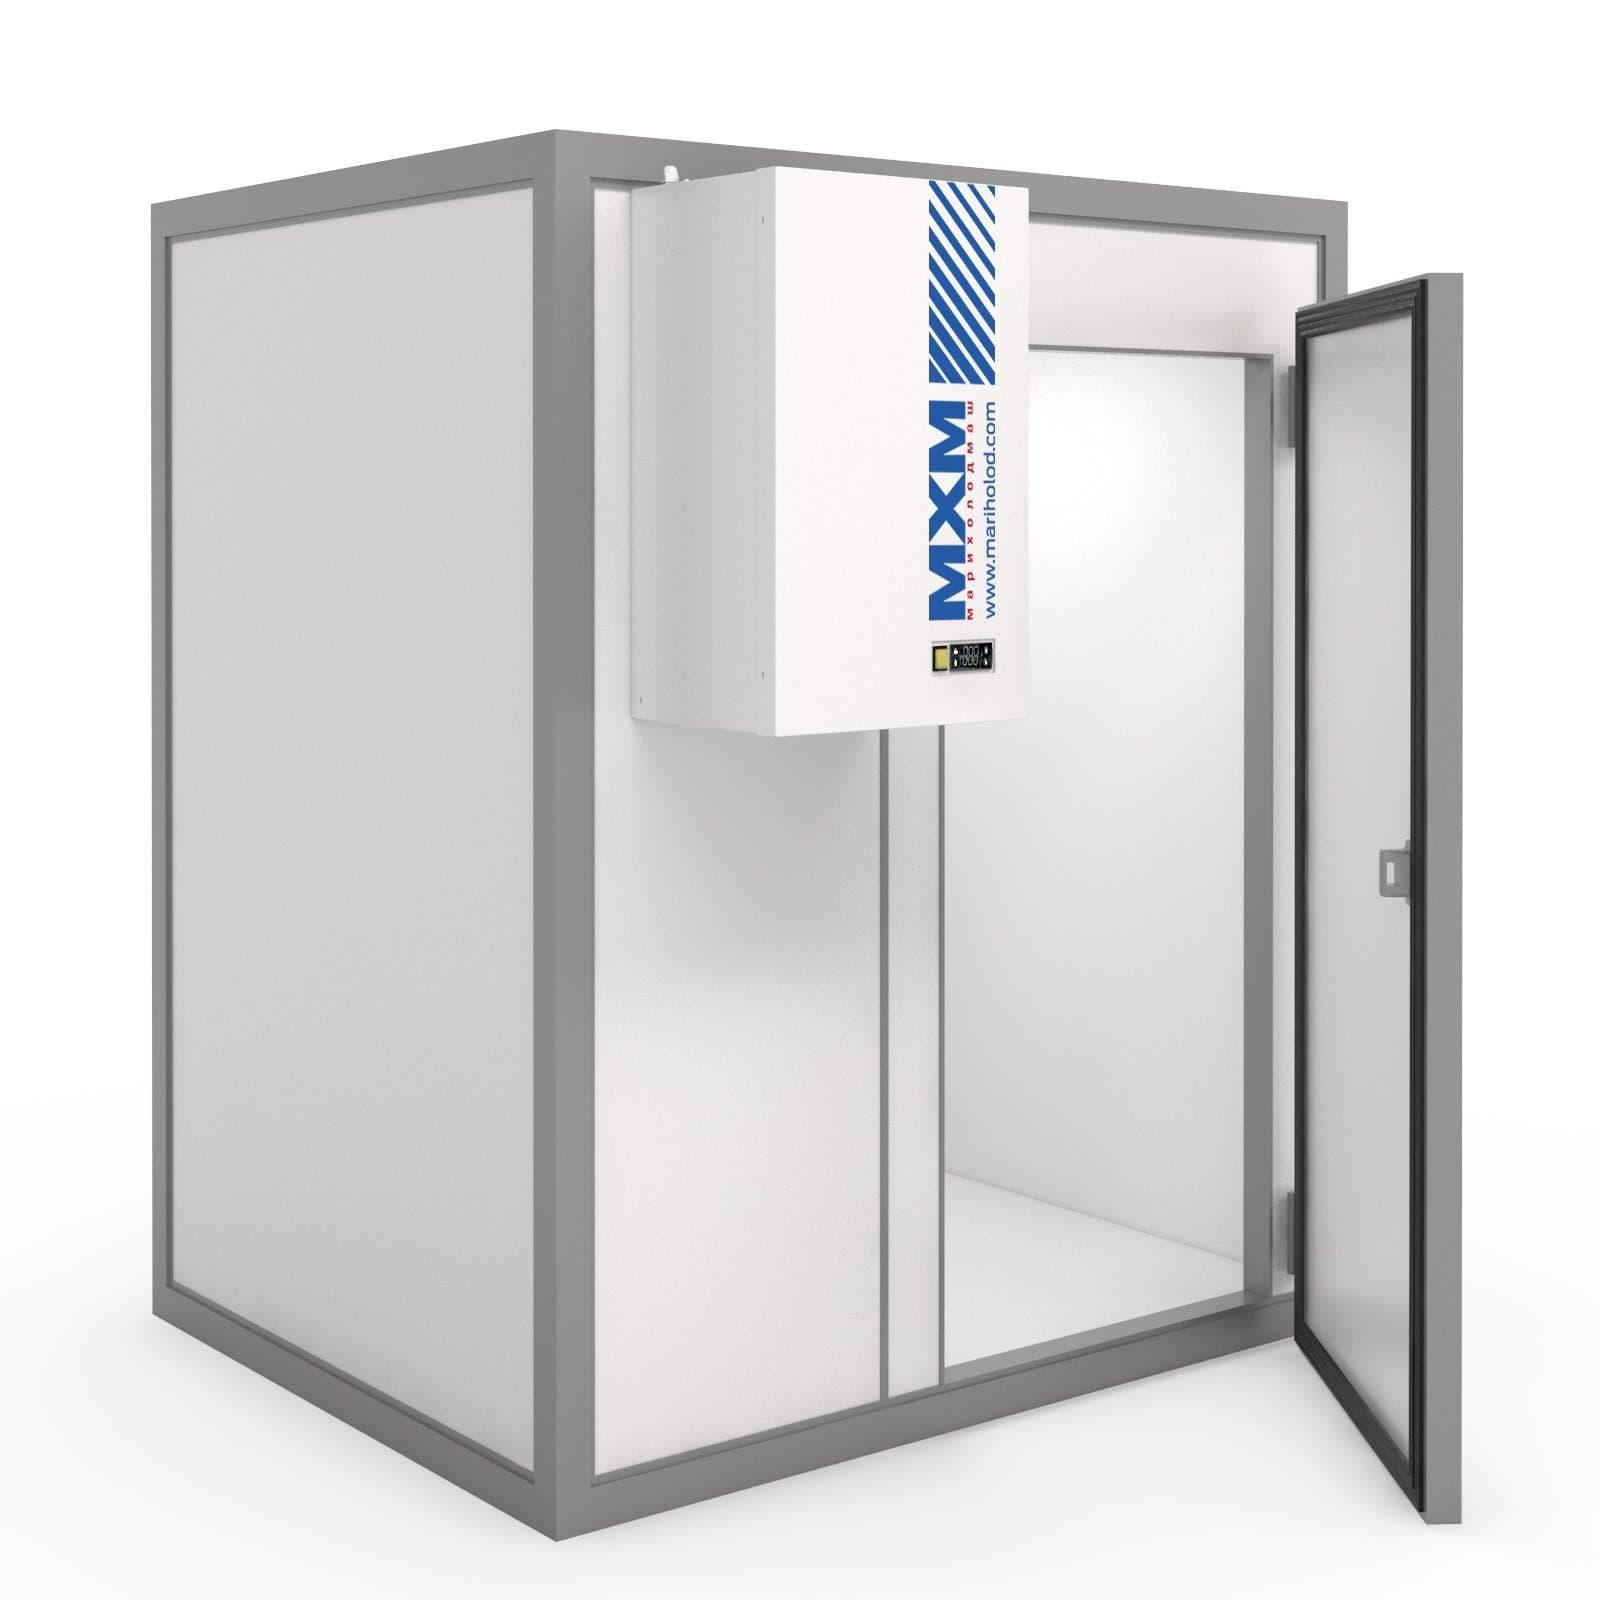 Камера холодильная МХМ КХН-50,12 2260×11860×2200